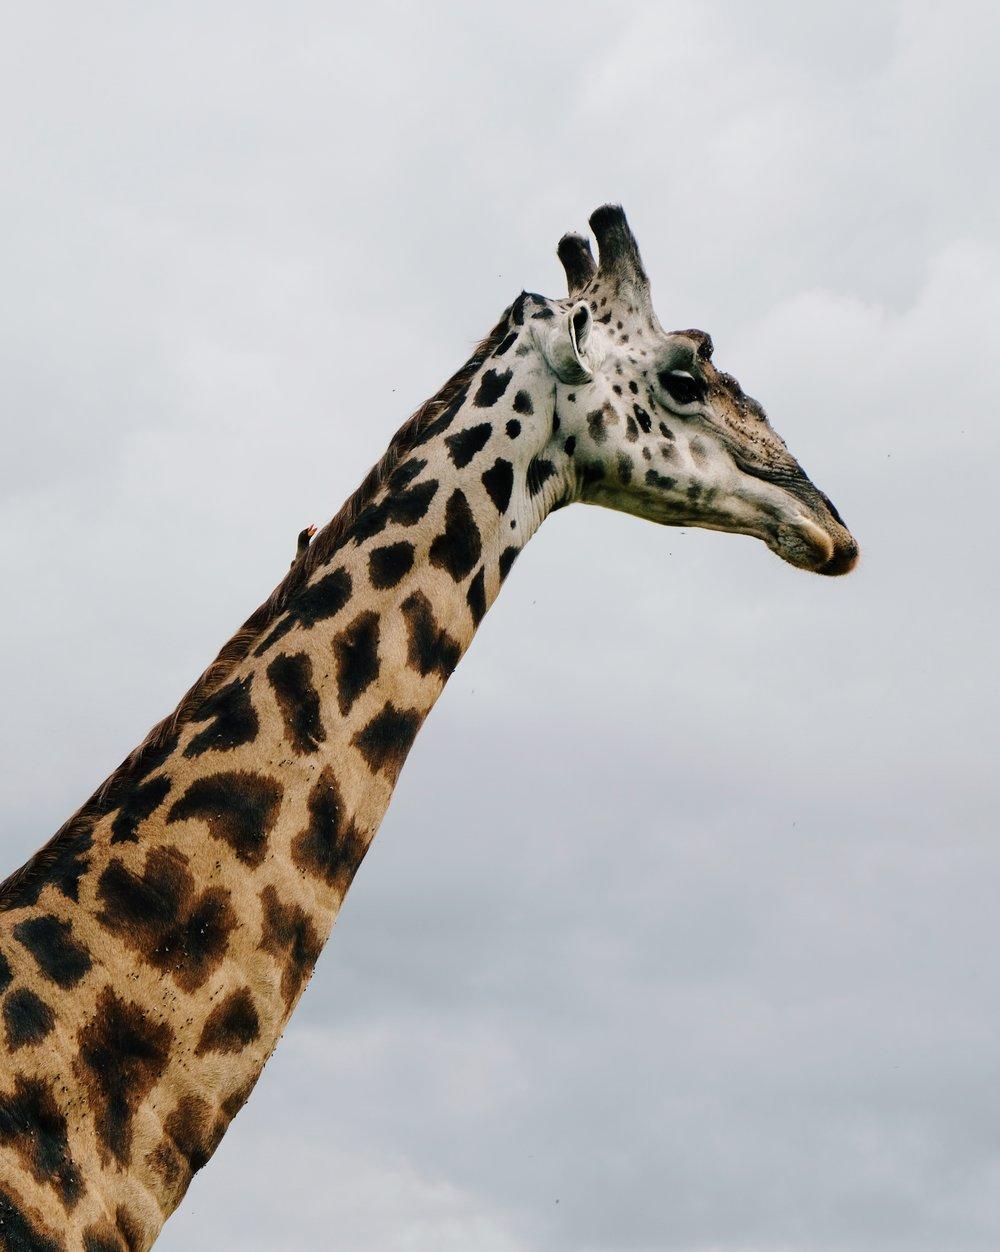 Giraffe in Maasai Mara Kenya by Joost Bastmeijer.jpeg